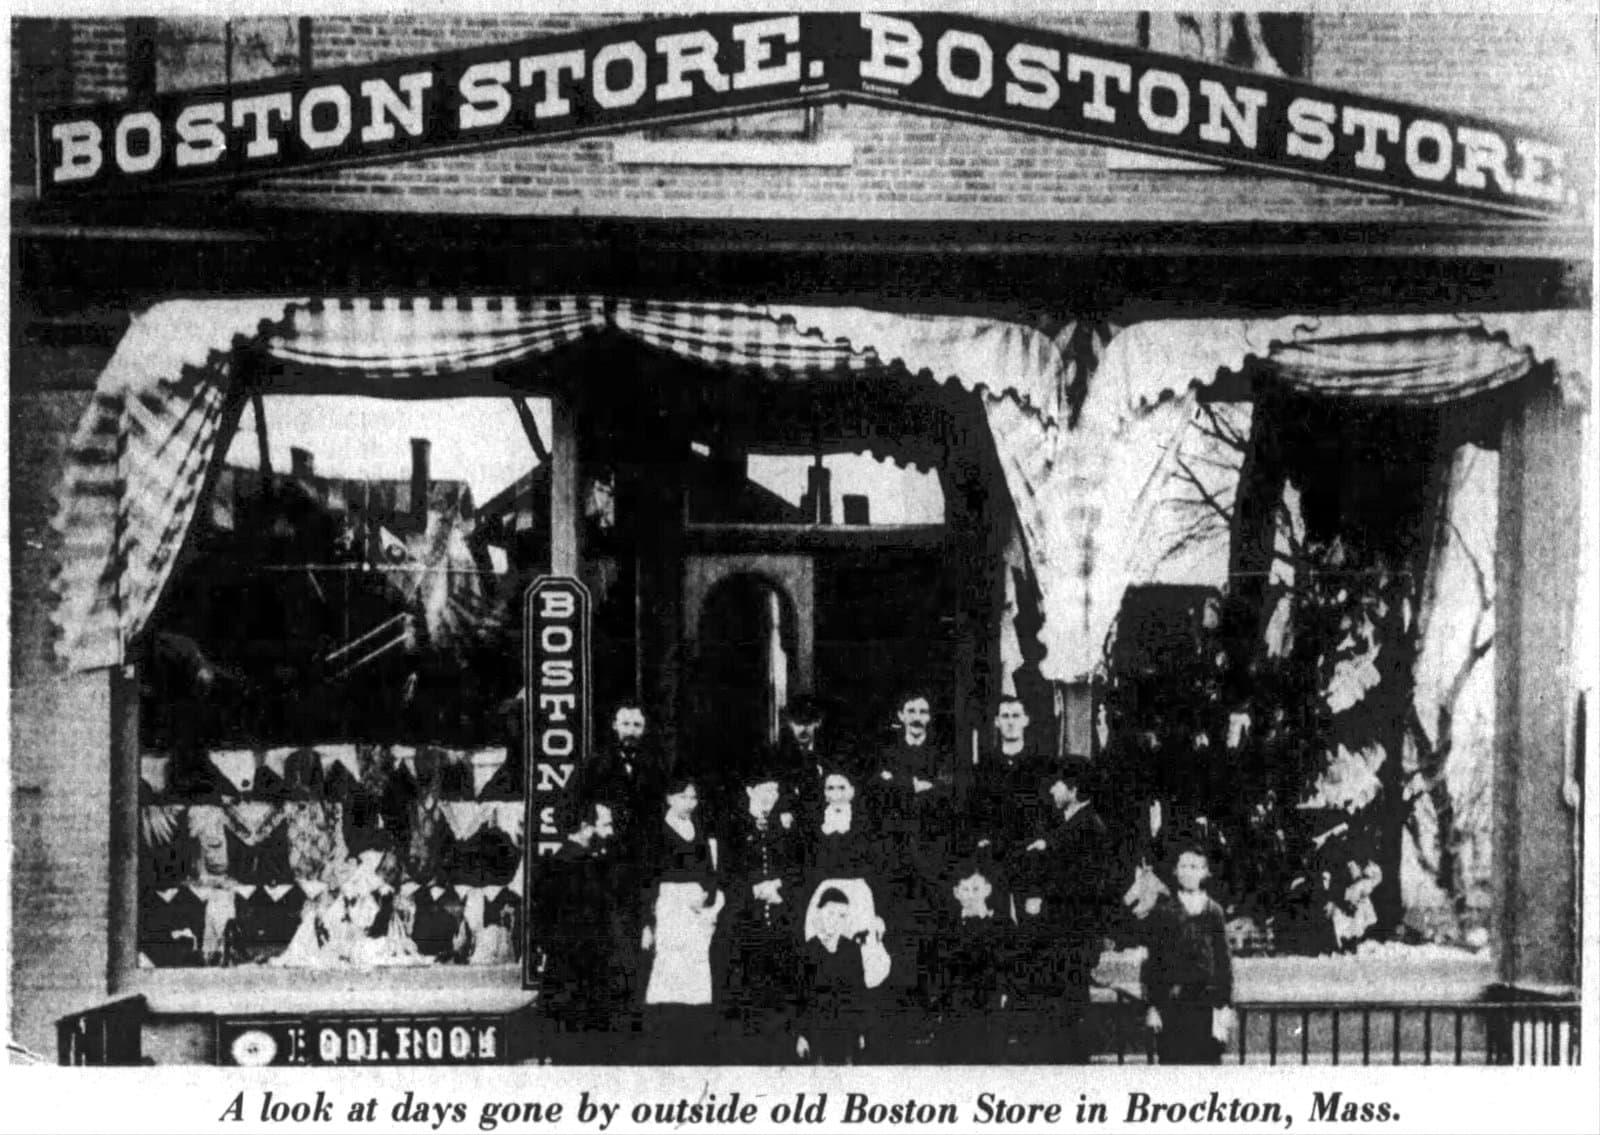 The Boston Store in Brockton Mass - James Edgar Santa Claus